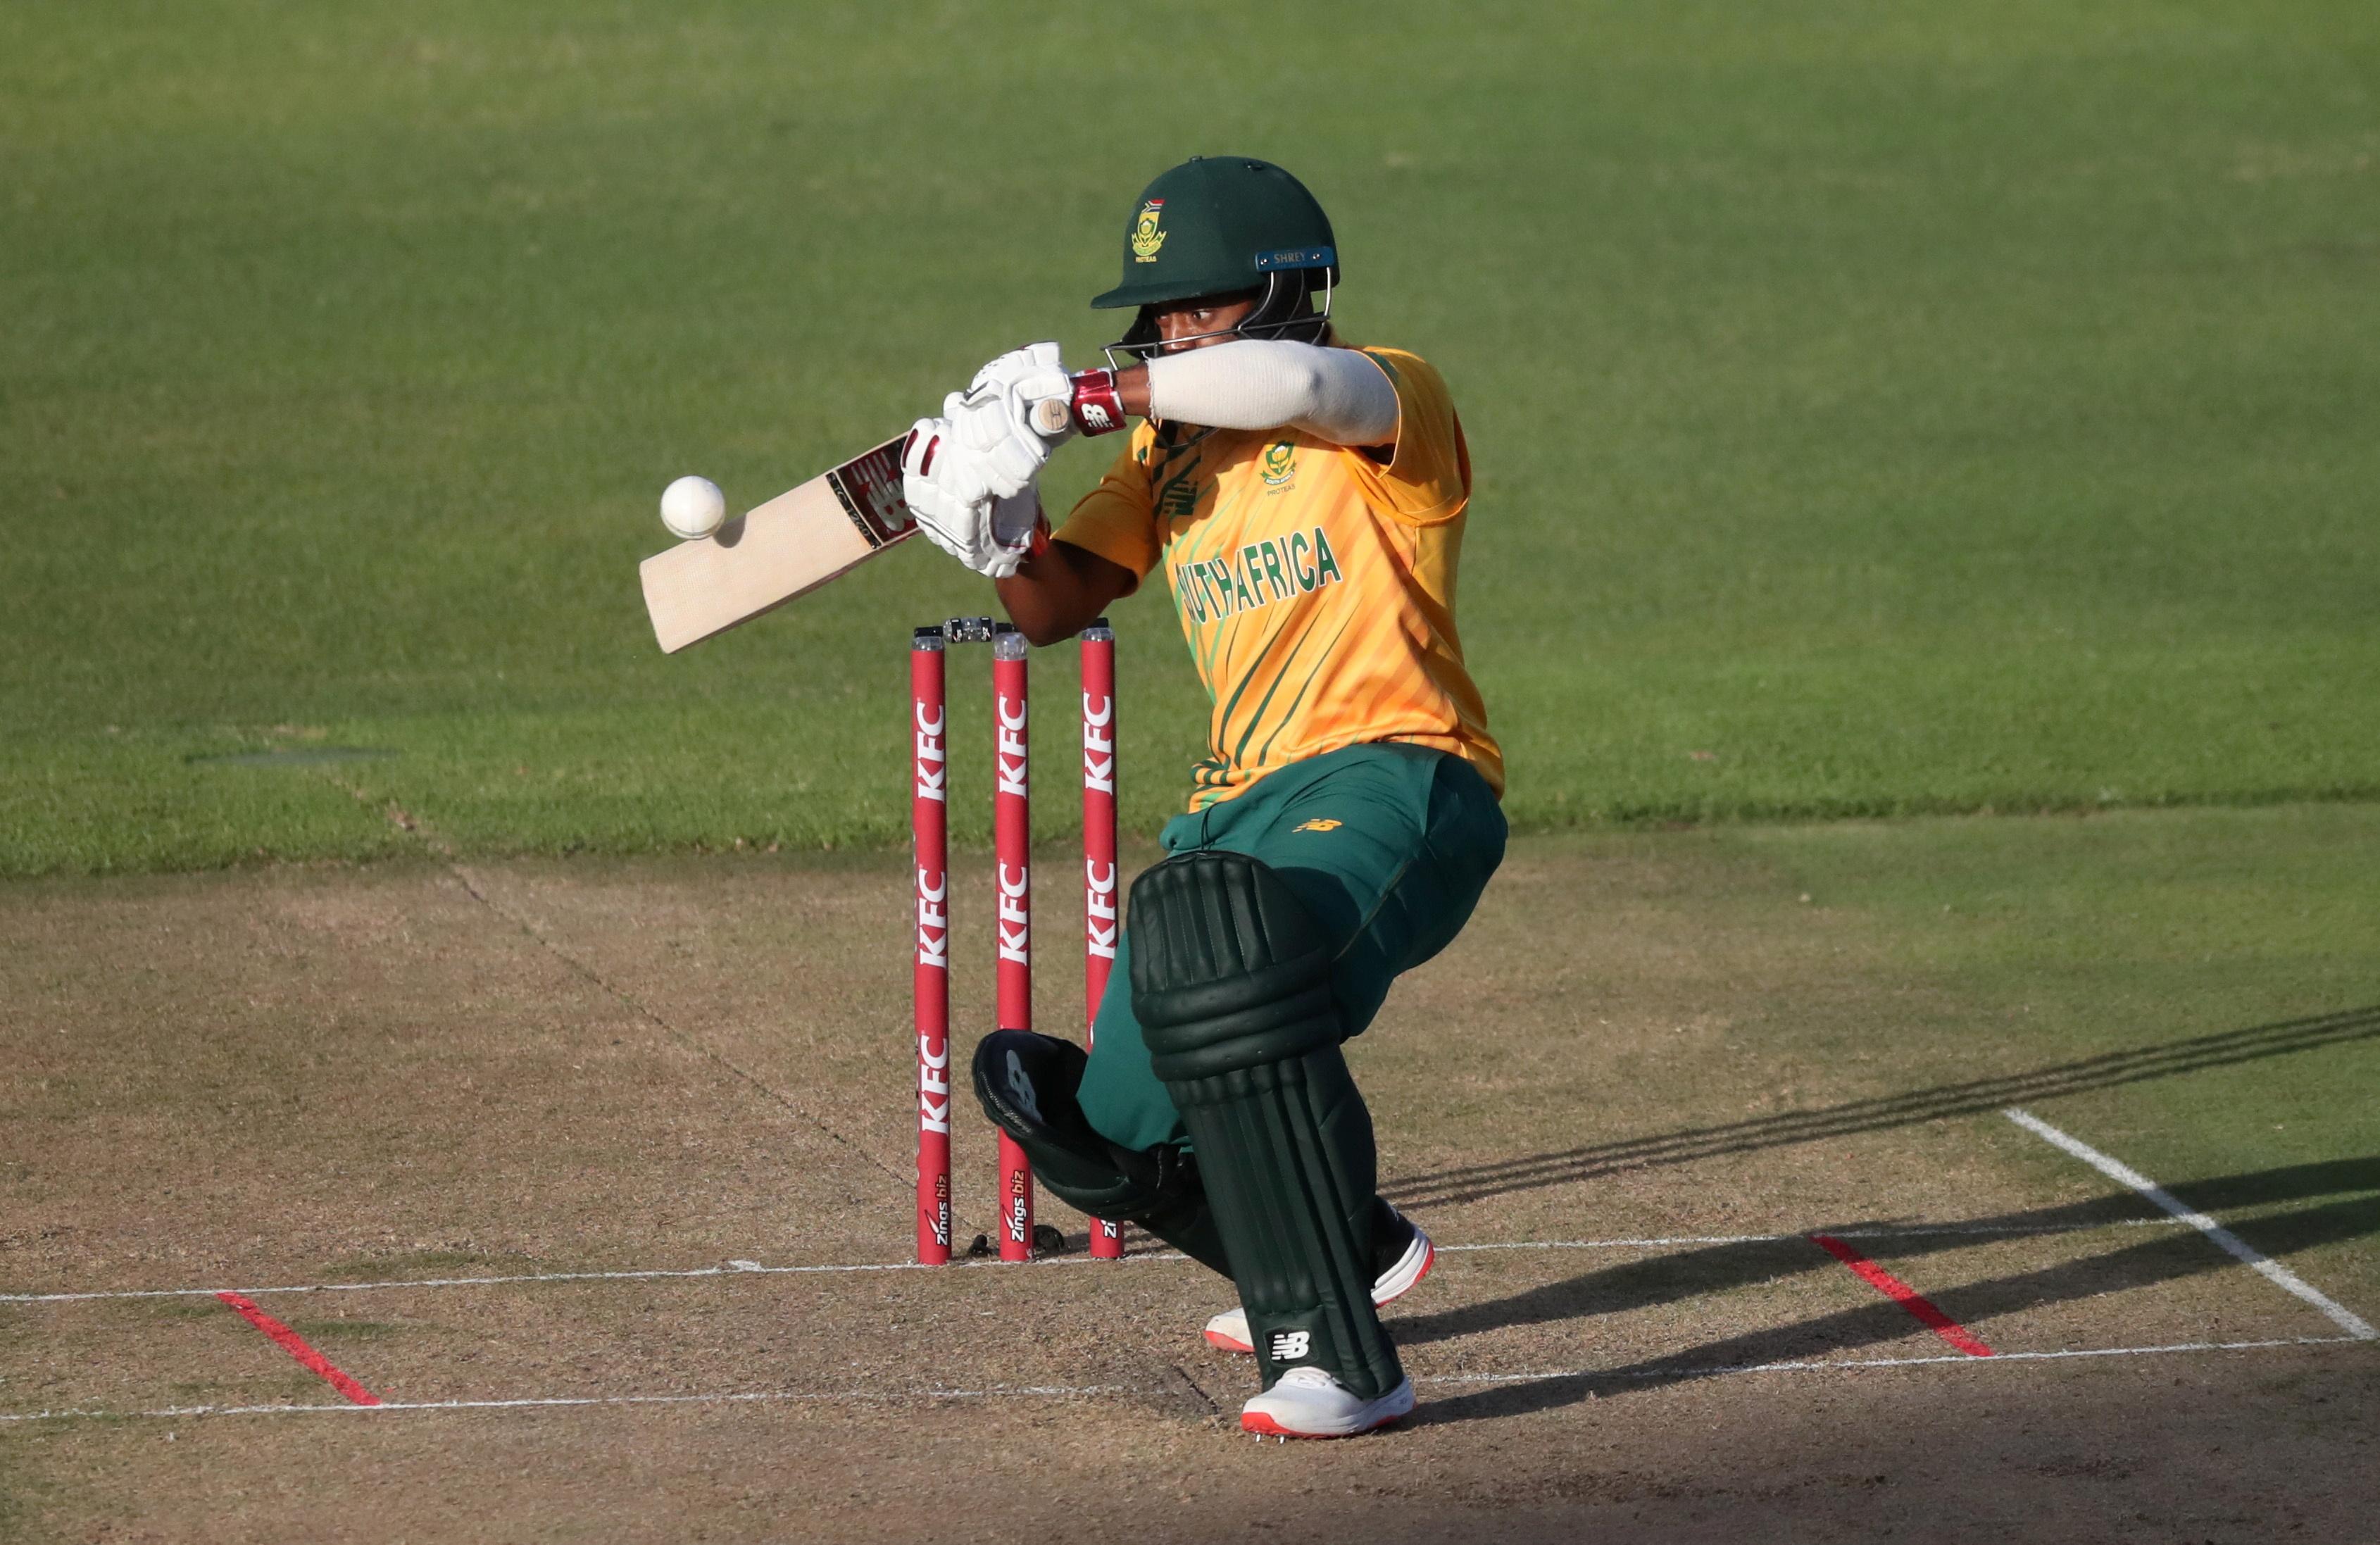 Cricket - Third International Twenty20 - South Africa v England - Newlands Cricket Ground, Cape Town, South Africa - December 1, 2020  South Africa's Temba Bavuma in action REUTERS/Sumaya Hisham/File Photo